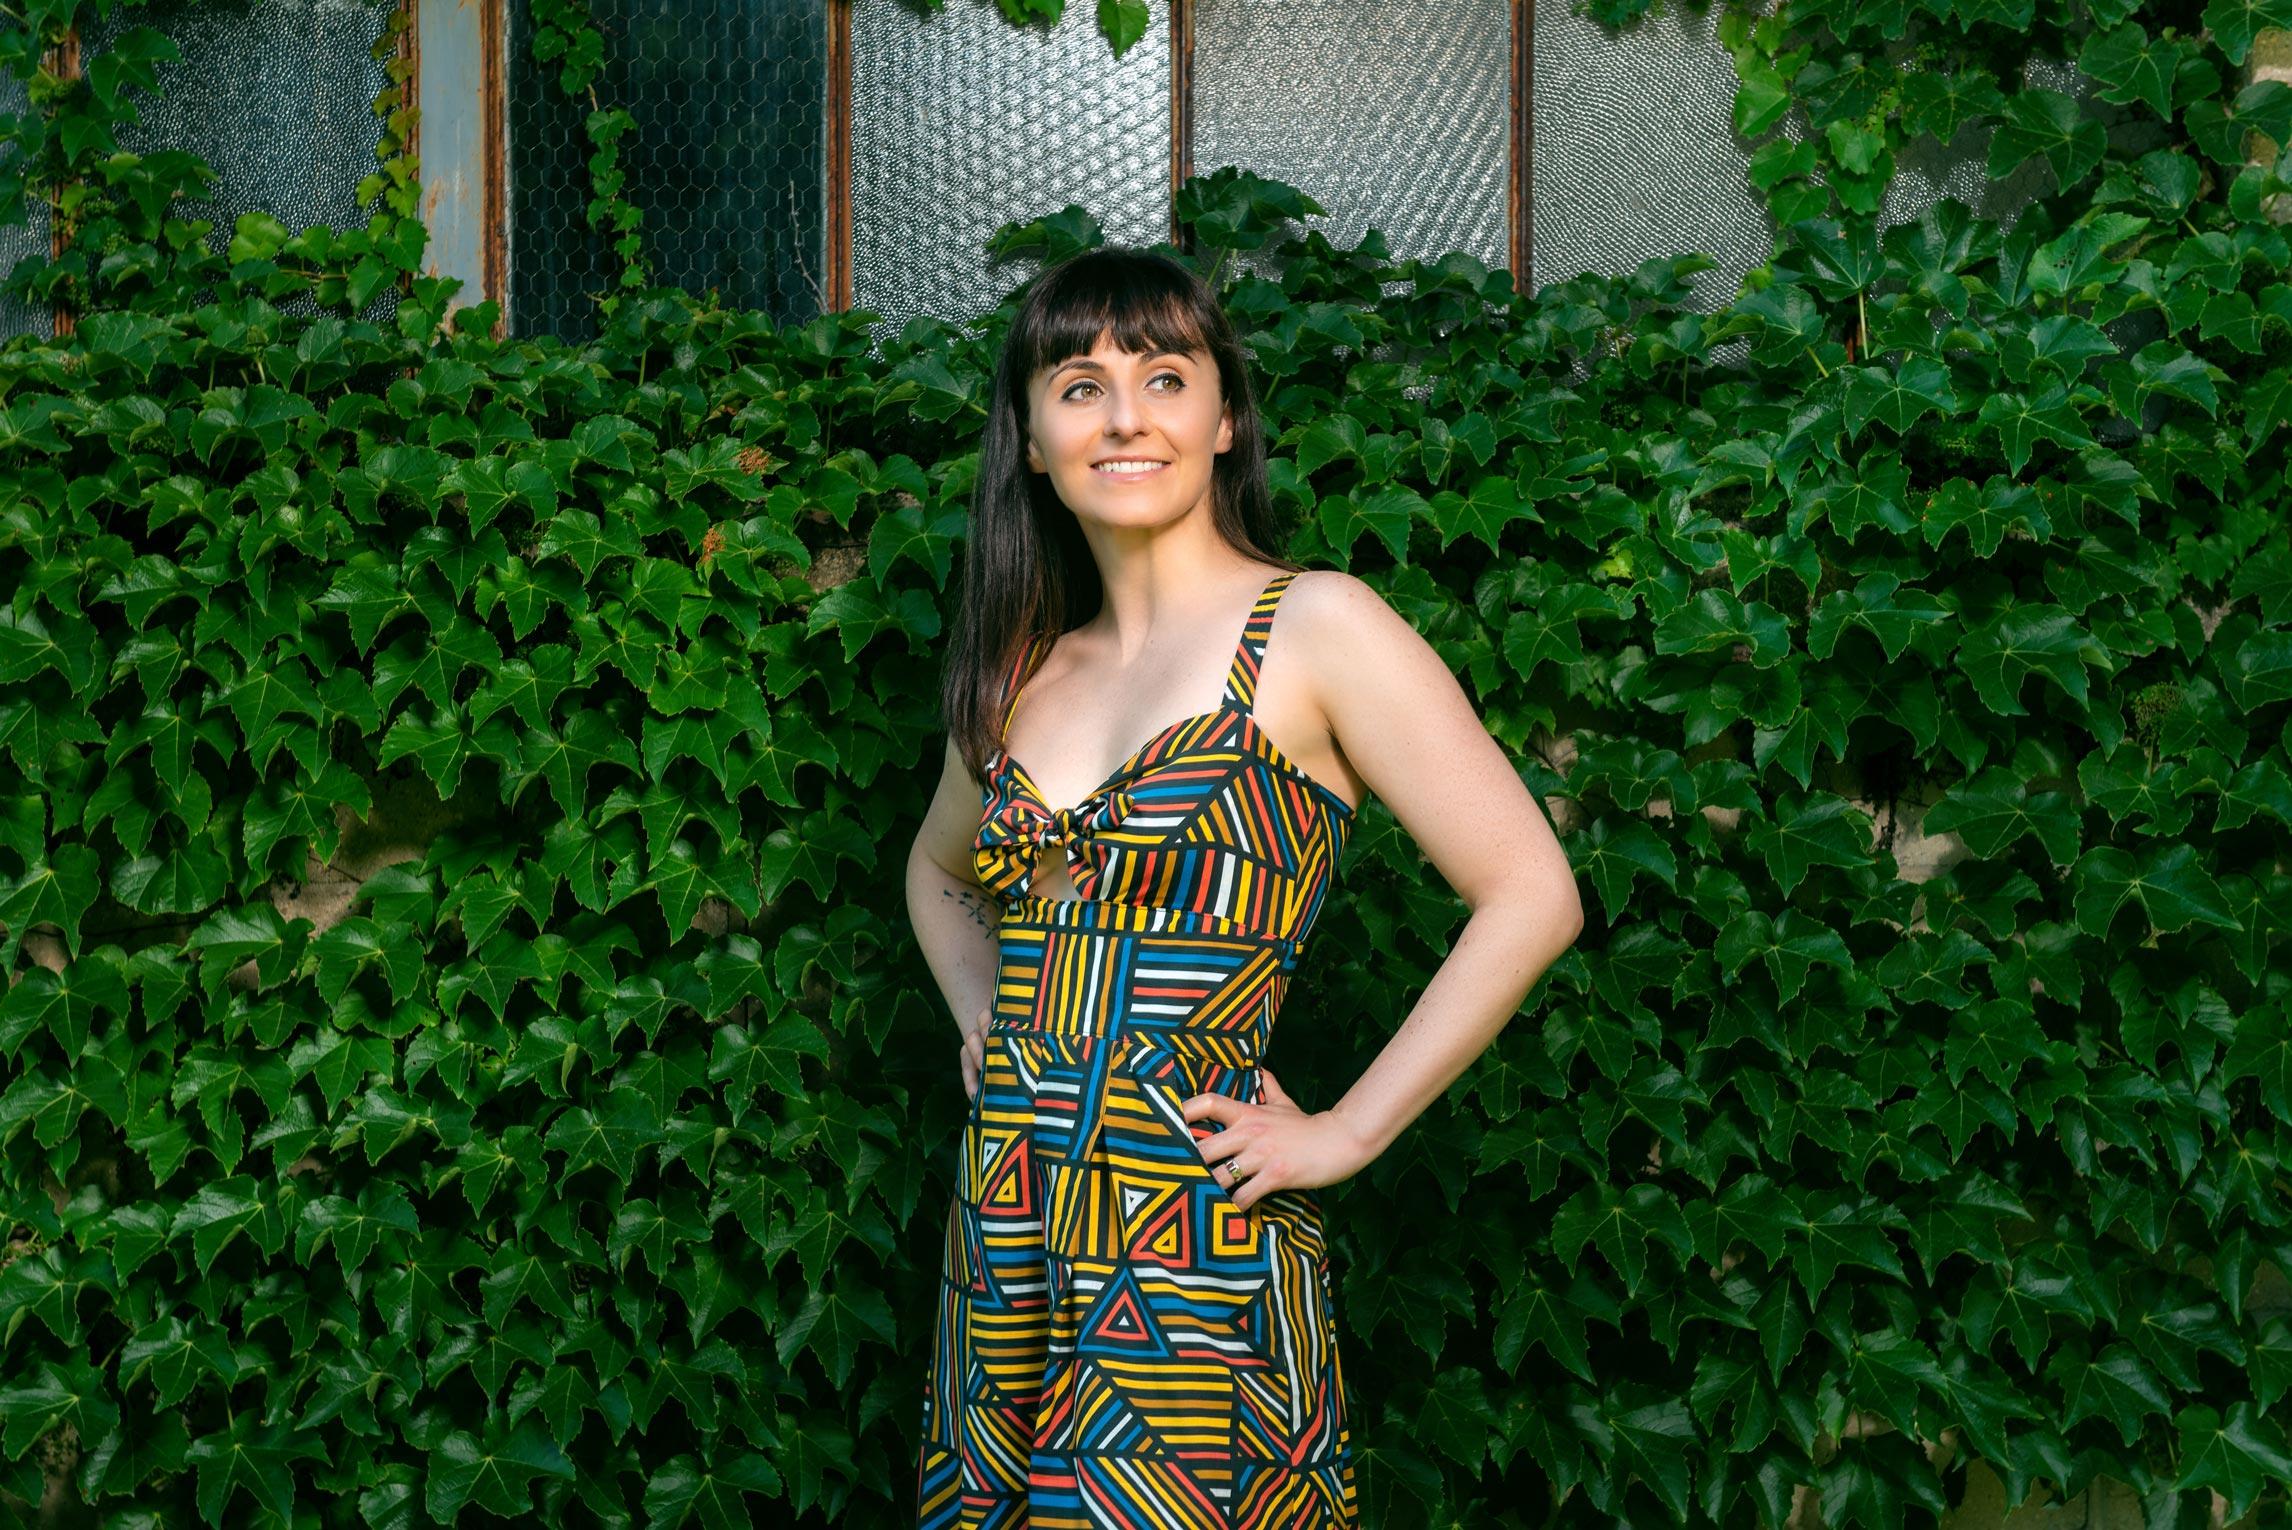 Fashion Editorial Photography - Seamstress Fashionista